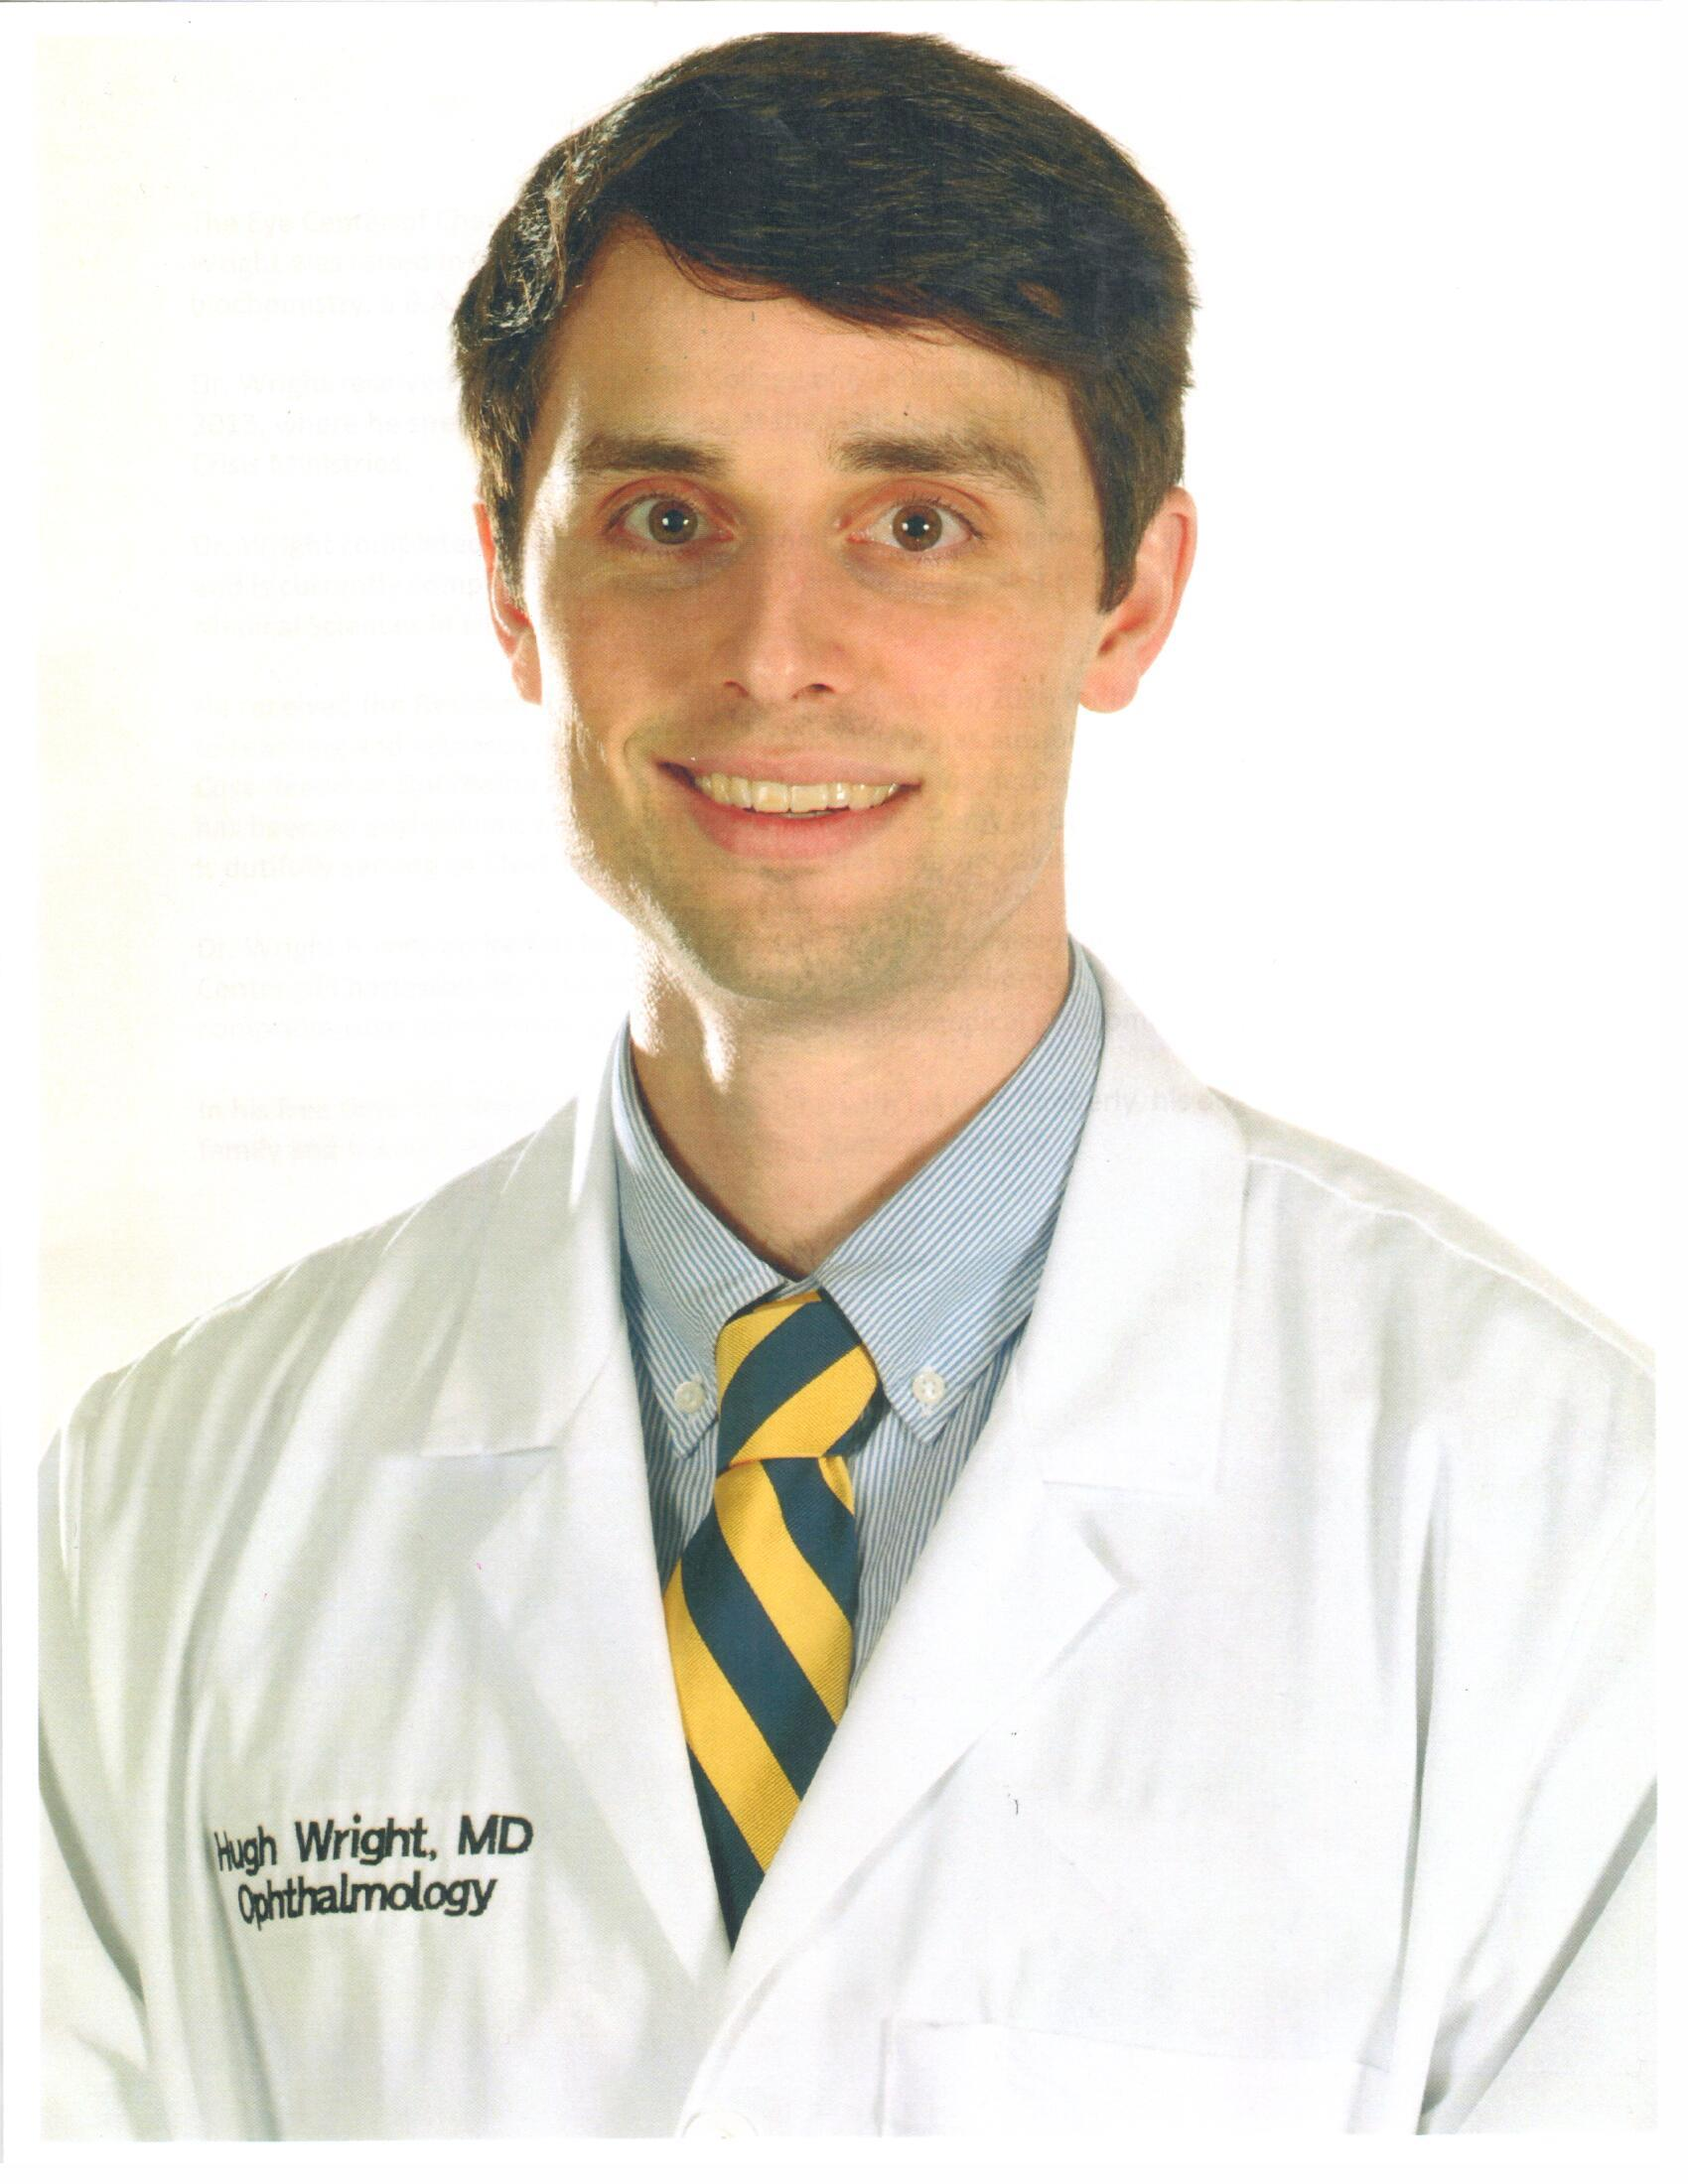 Hugh Wright III, M.D.